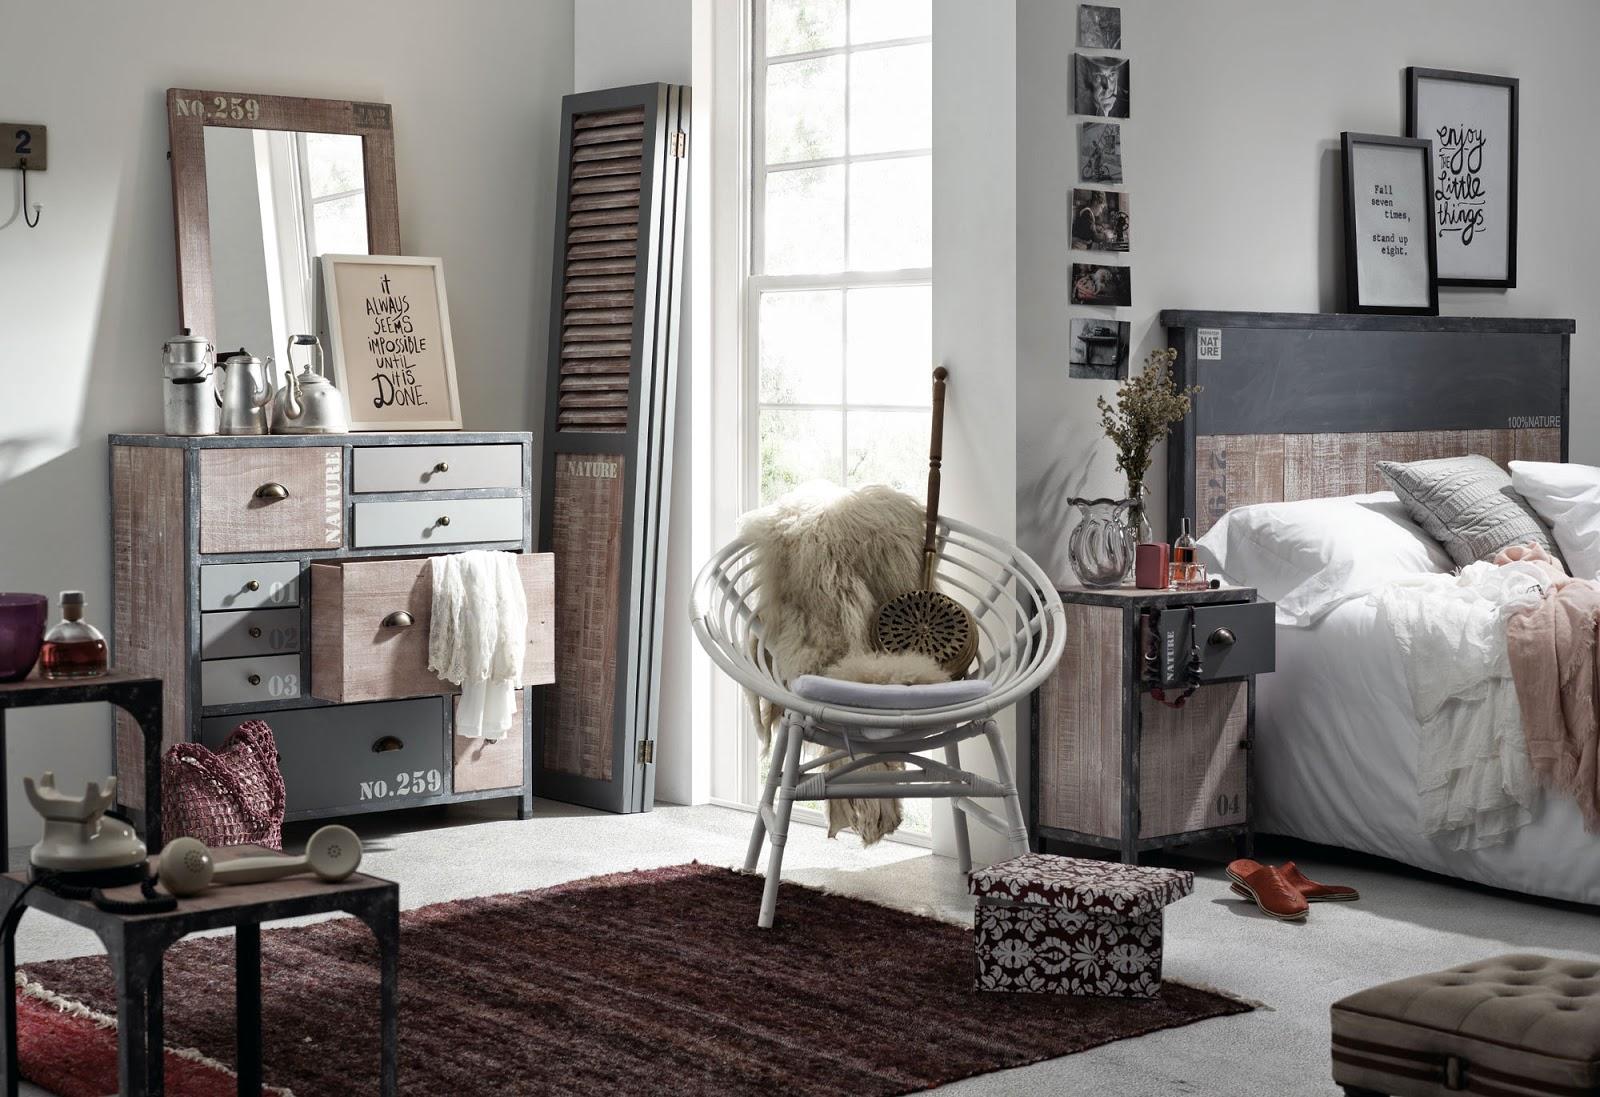 http://www.portobellostreet.es/mueble/38316/Dormitorio-industrial-Vintage-Erutna-II